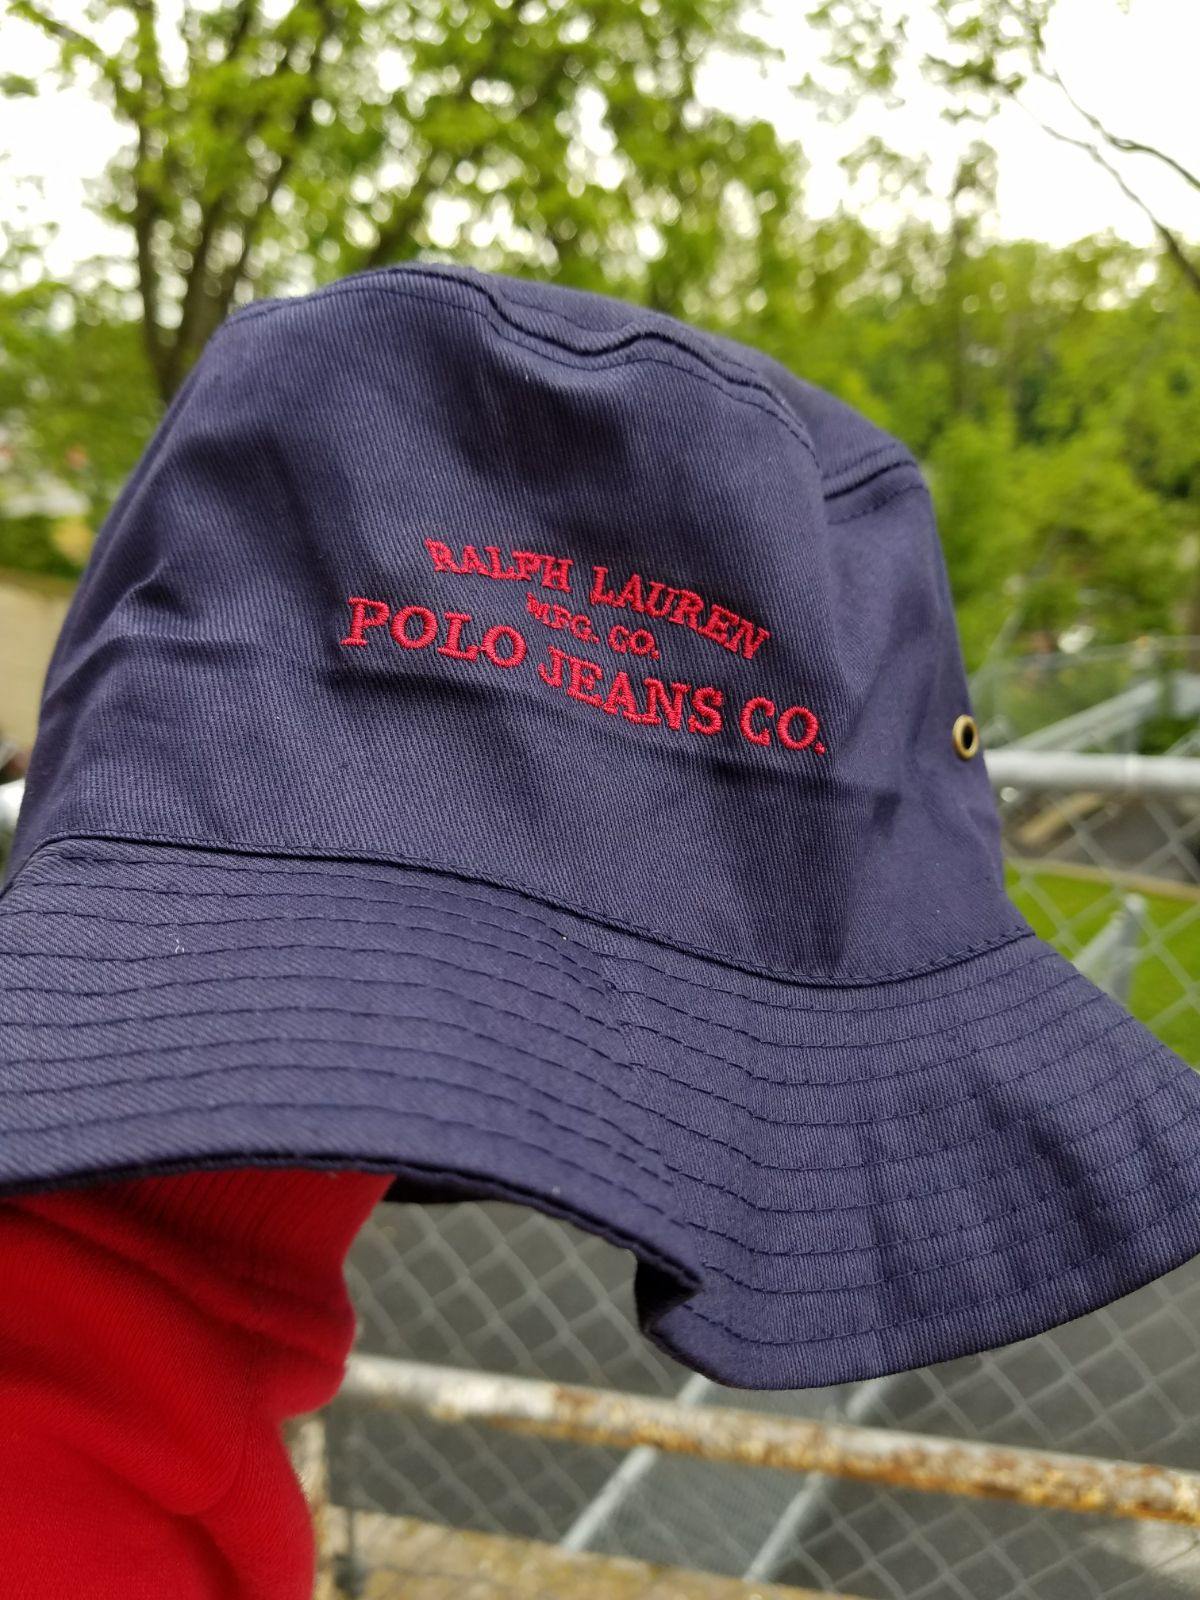 Vintage BOOTLEG RL polo jeans bucket hat